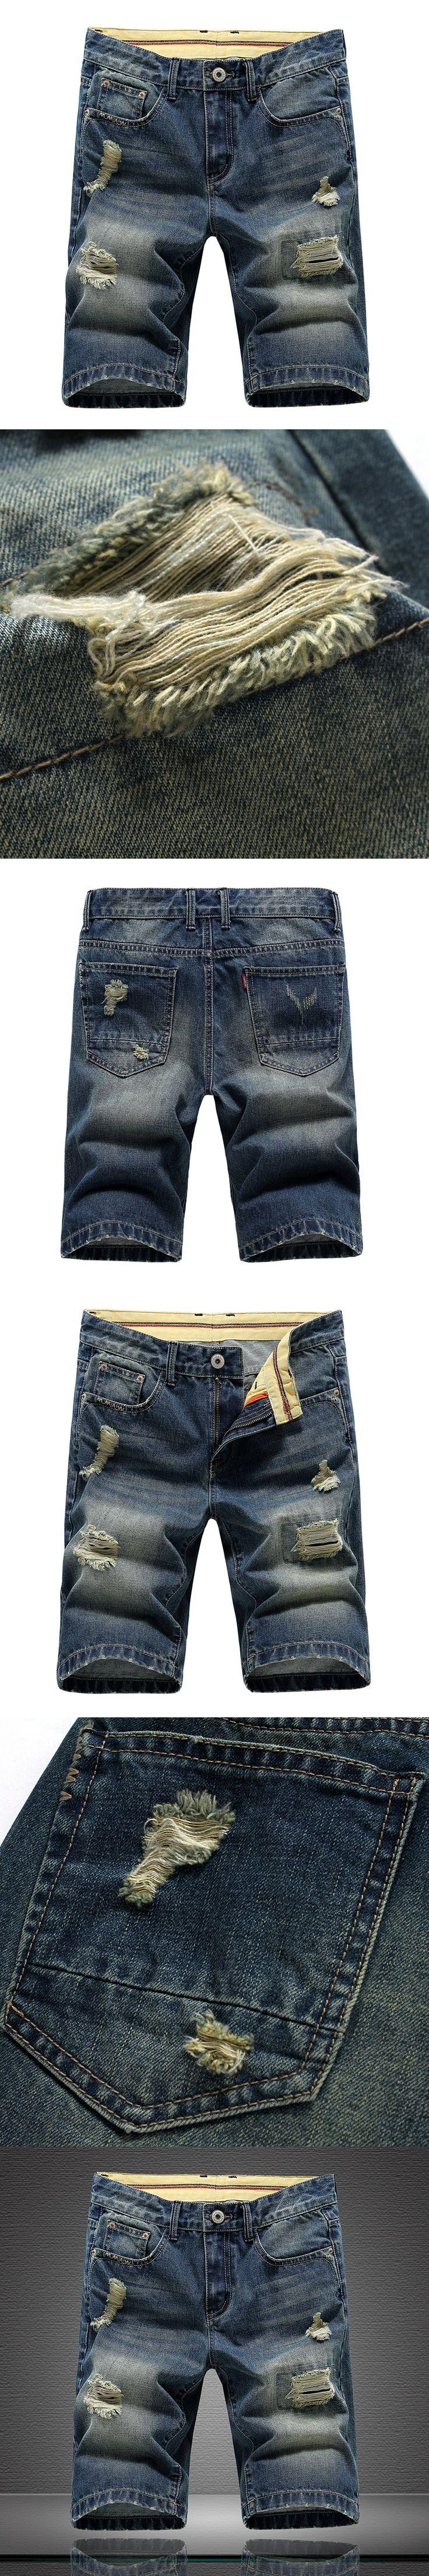 Summer Bermuda Rushed train Zipper Short Jeans Homme Metrosexual Casual Denim Jeans Short Male Straight Hole Men's Knee Length